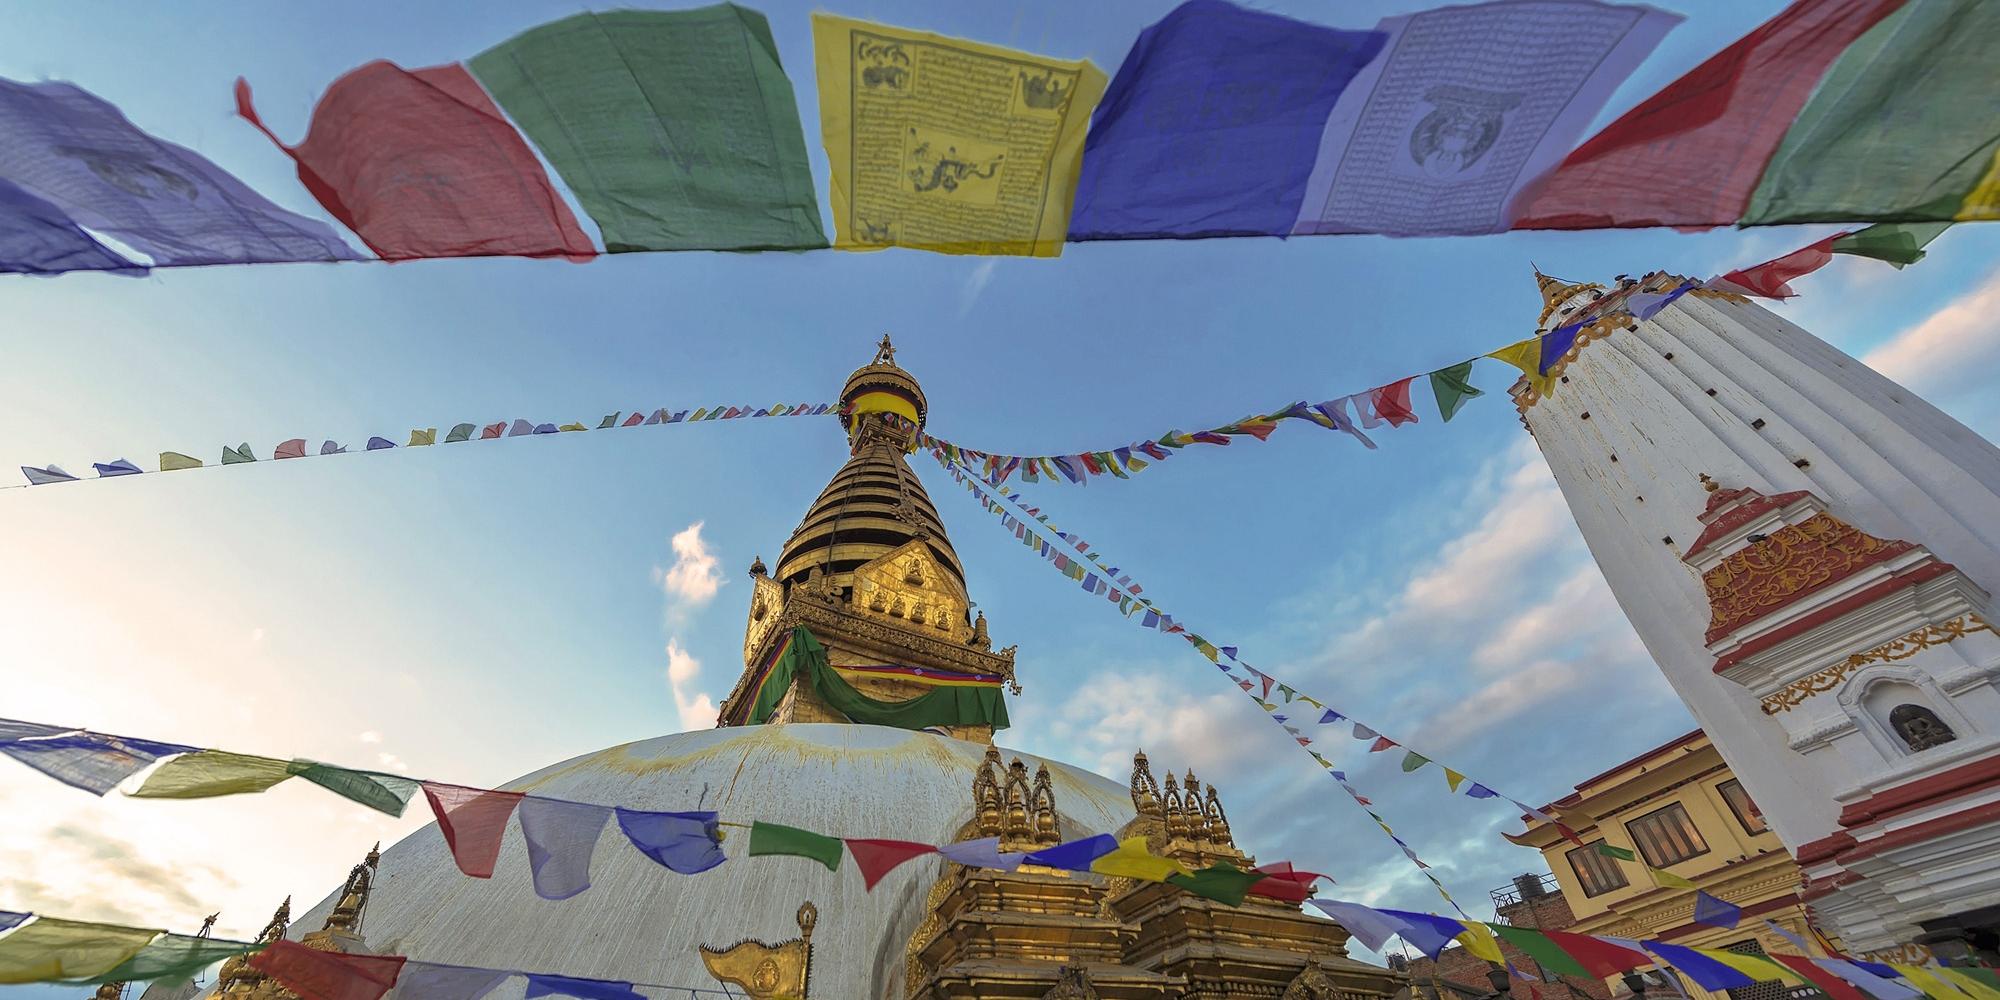 Chandragiri Hill Day Tour with Swayambhunath Stupa